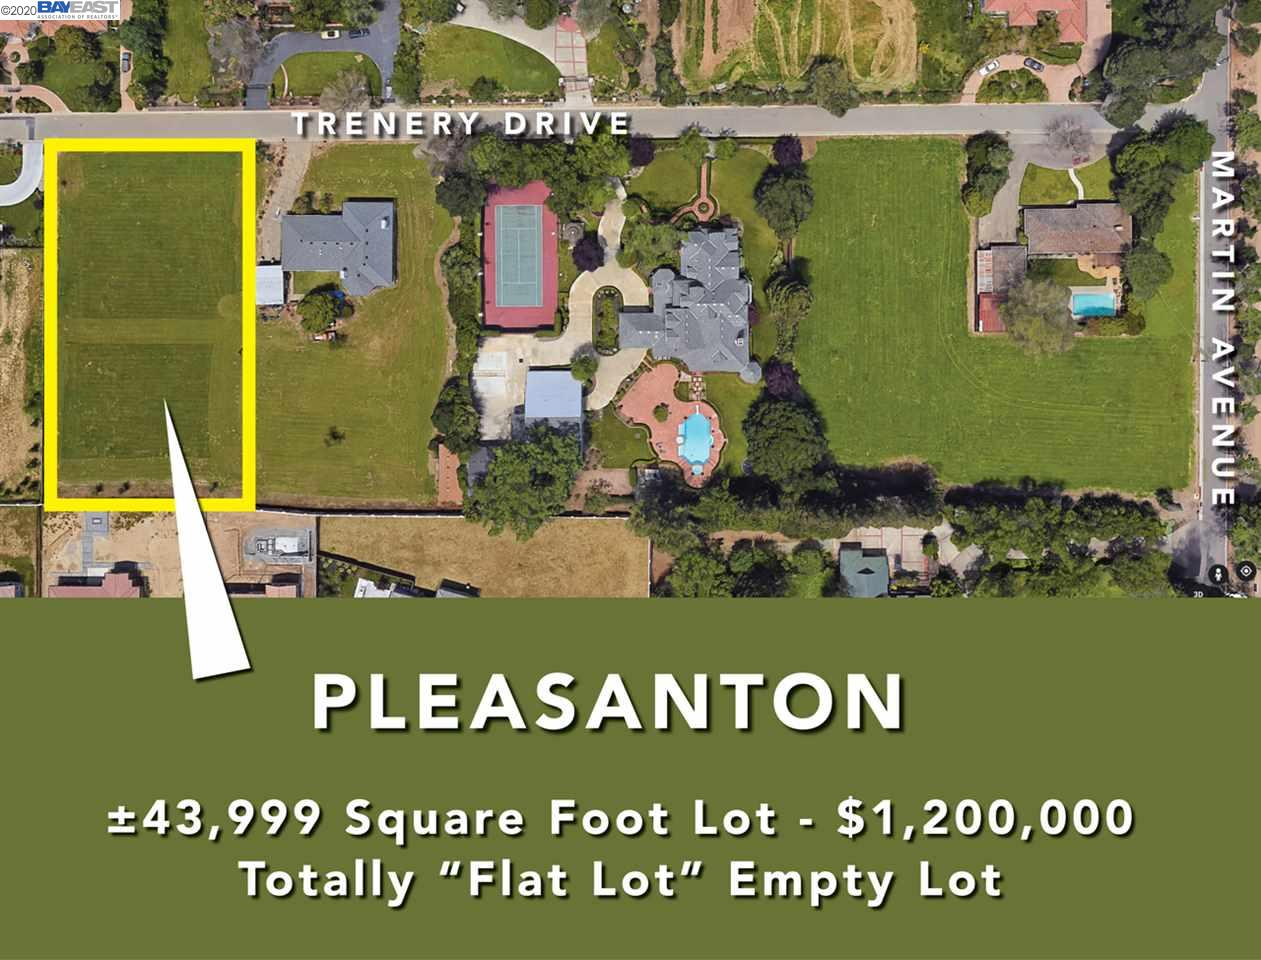 3737 Trenery Dr Pleasanton, CA 94588